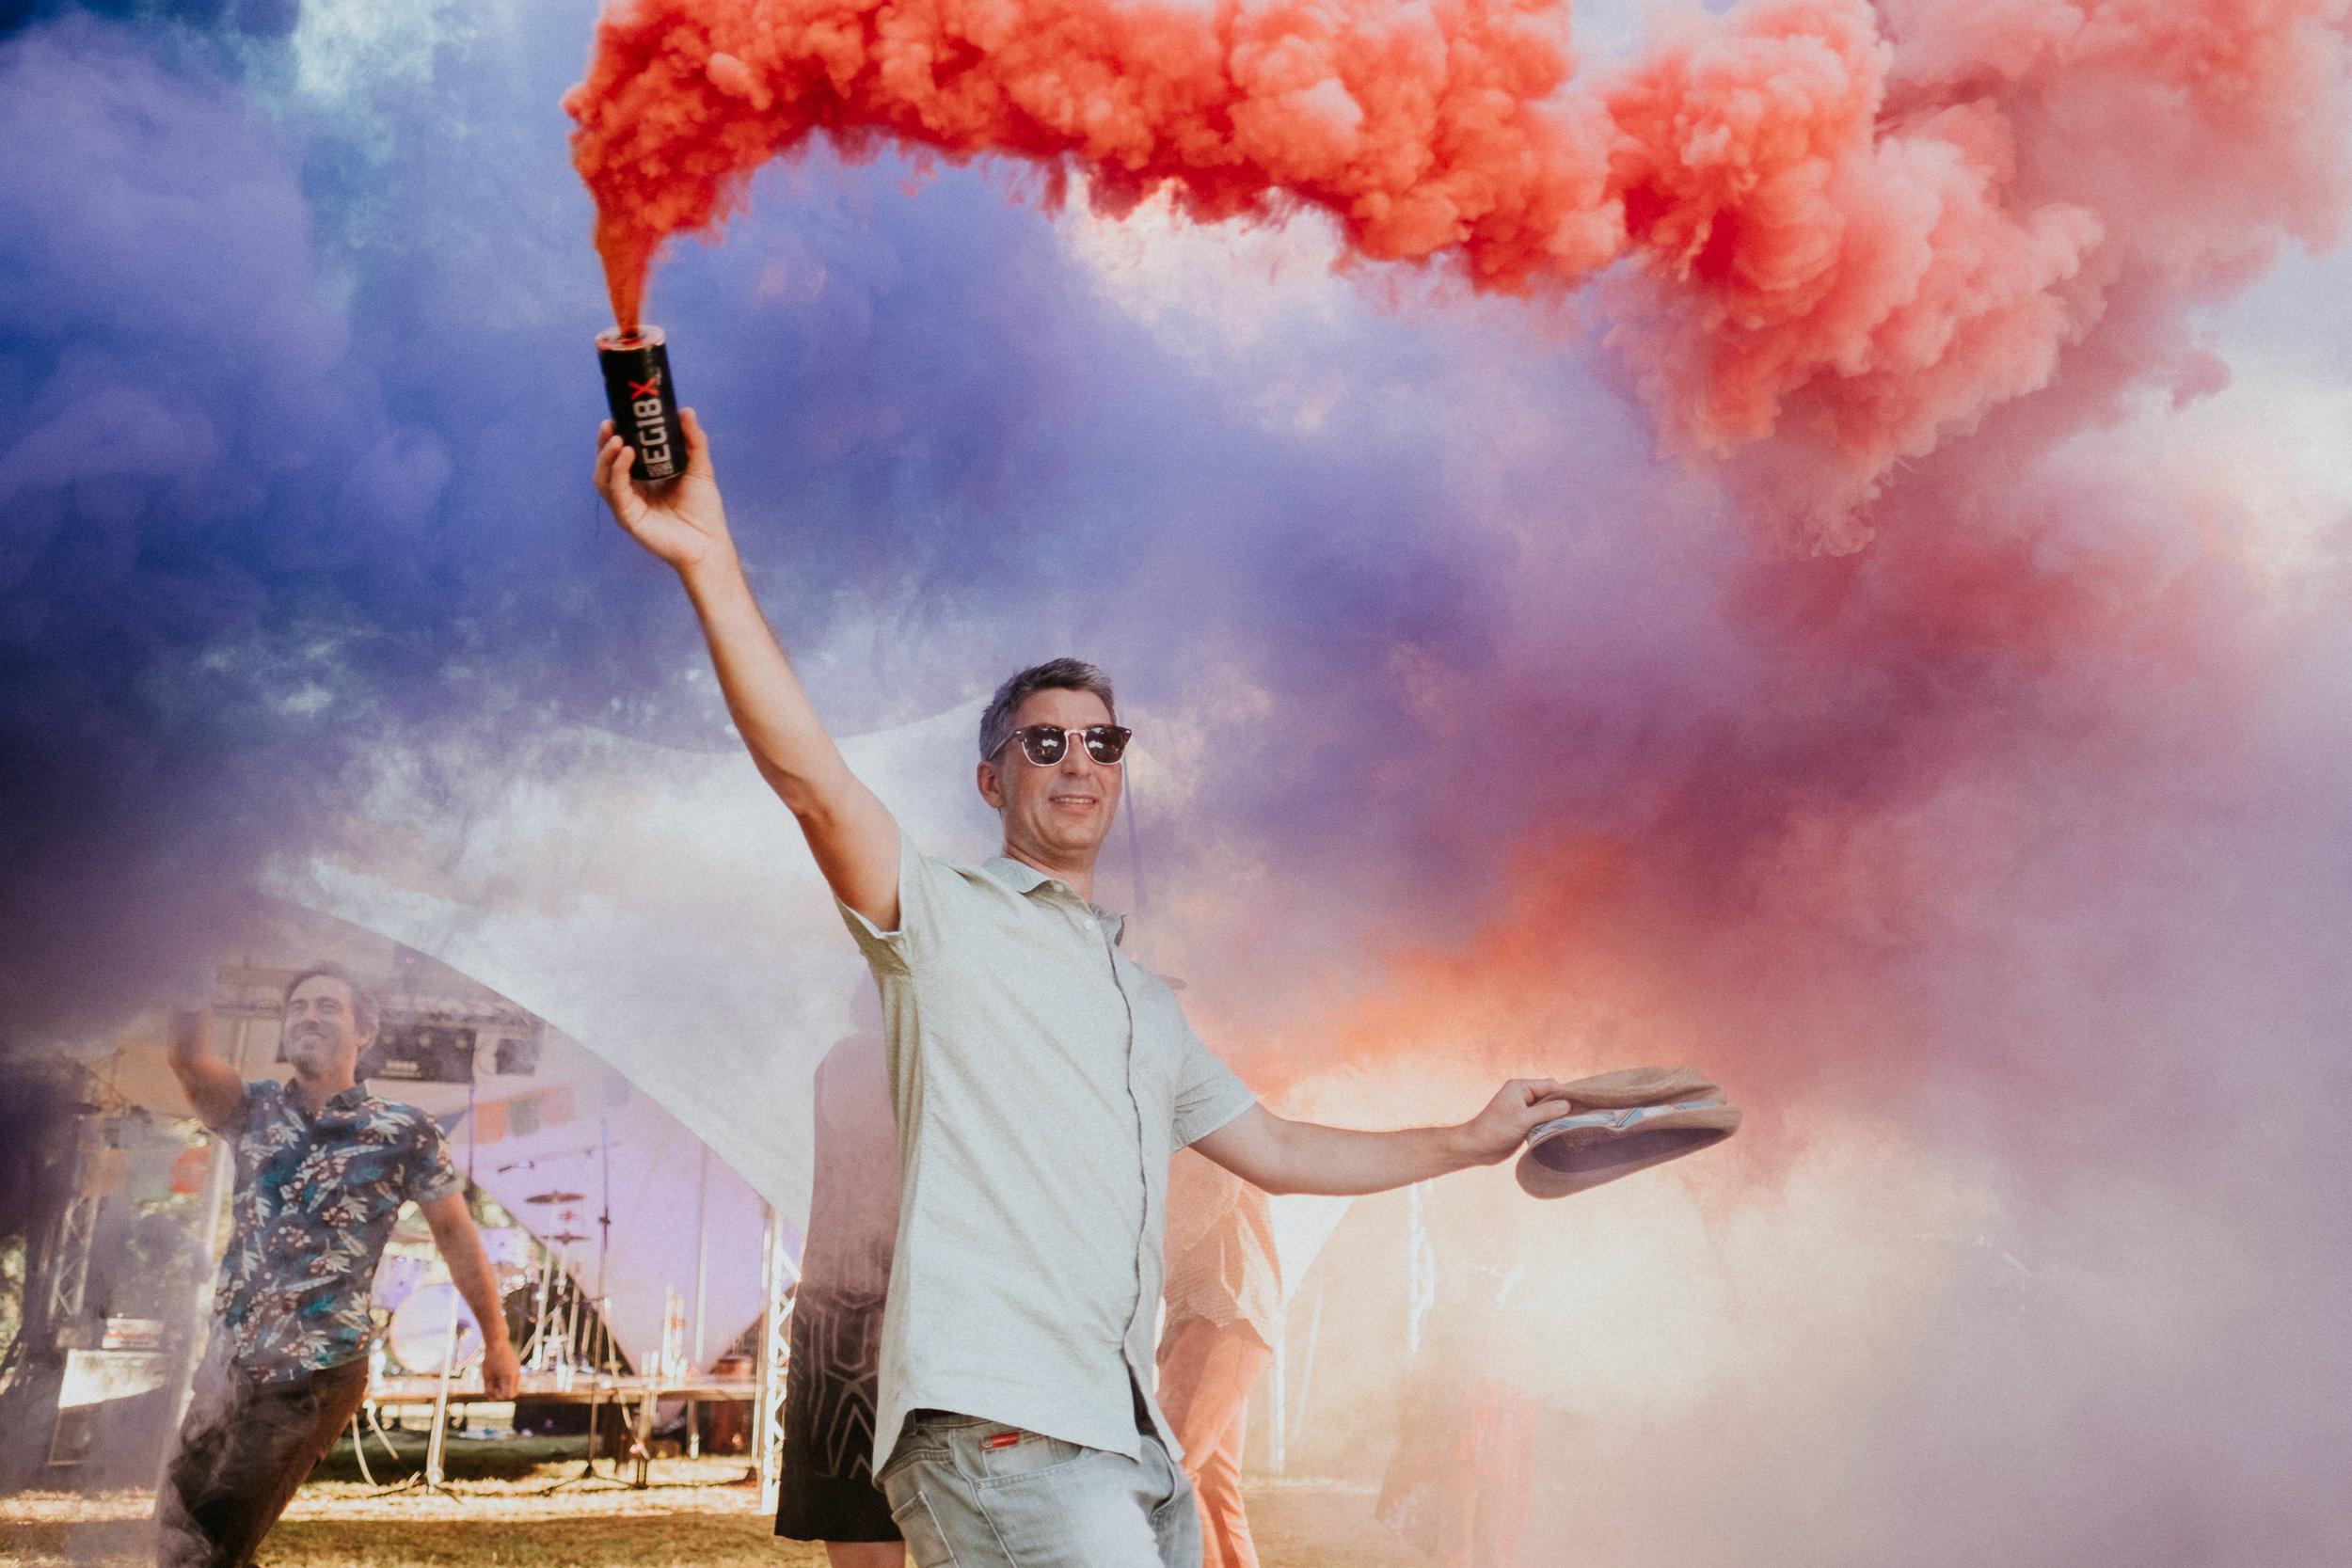 7 Festival wedding smoke bombs fun creative cool joanna nicole photography2.jpg